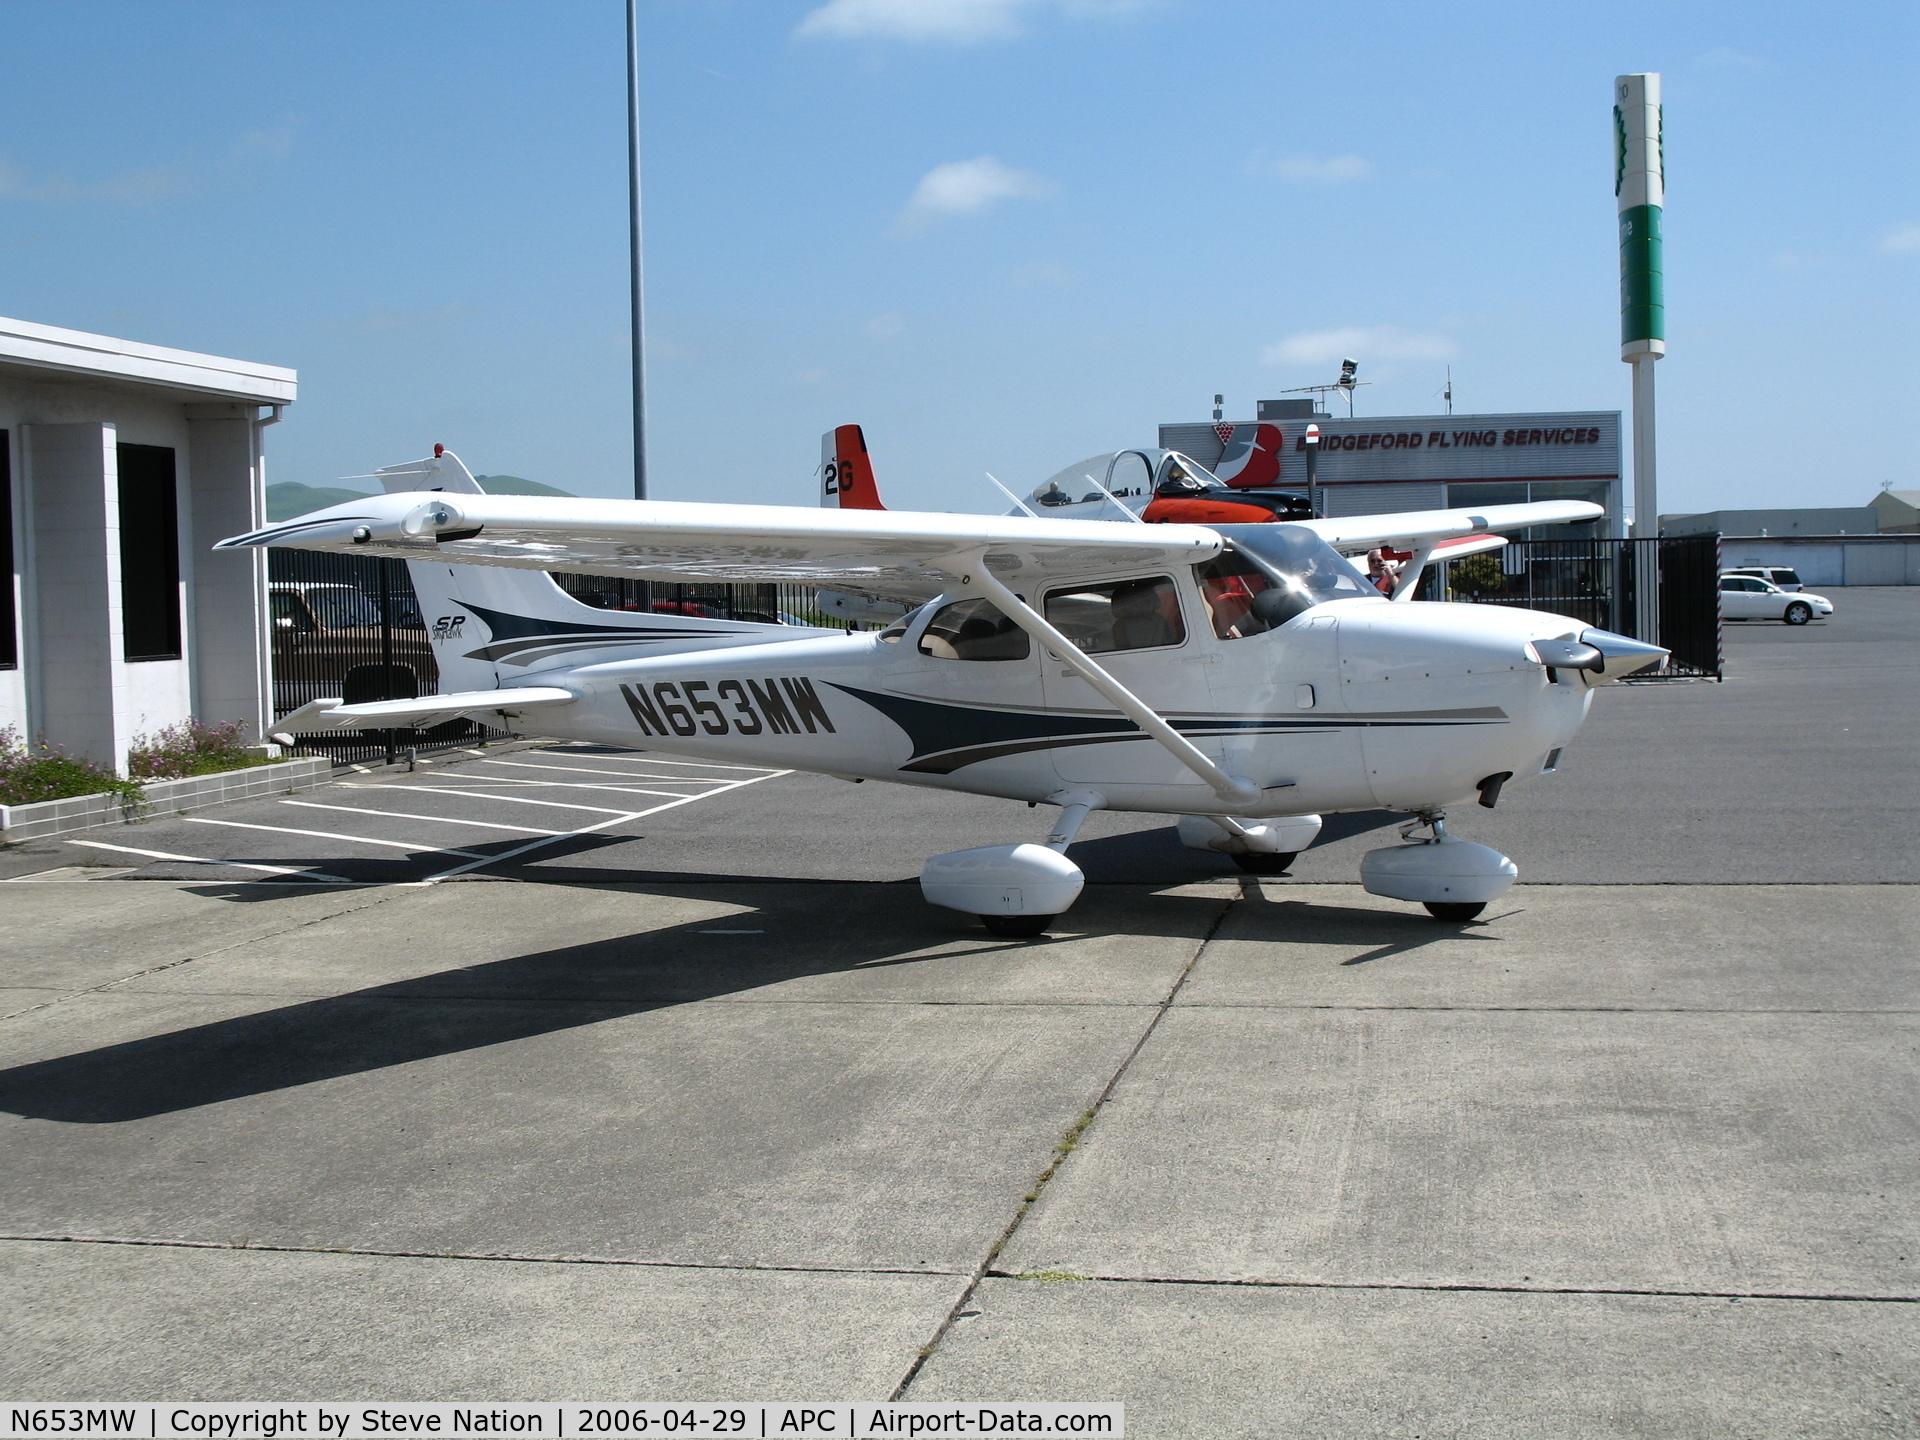 N653MW, 2004 Cessna 172S Skyhawk C/N 172S9653, Bridgeford Flying Service 2004 Cessna 172S @ Napa County Airport, CA